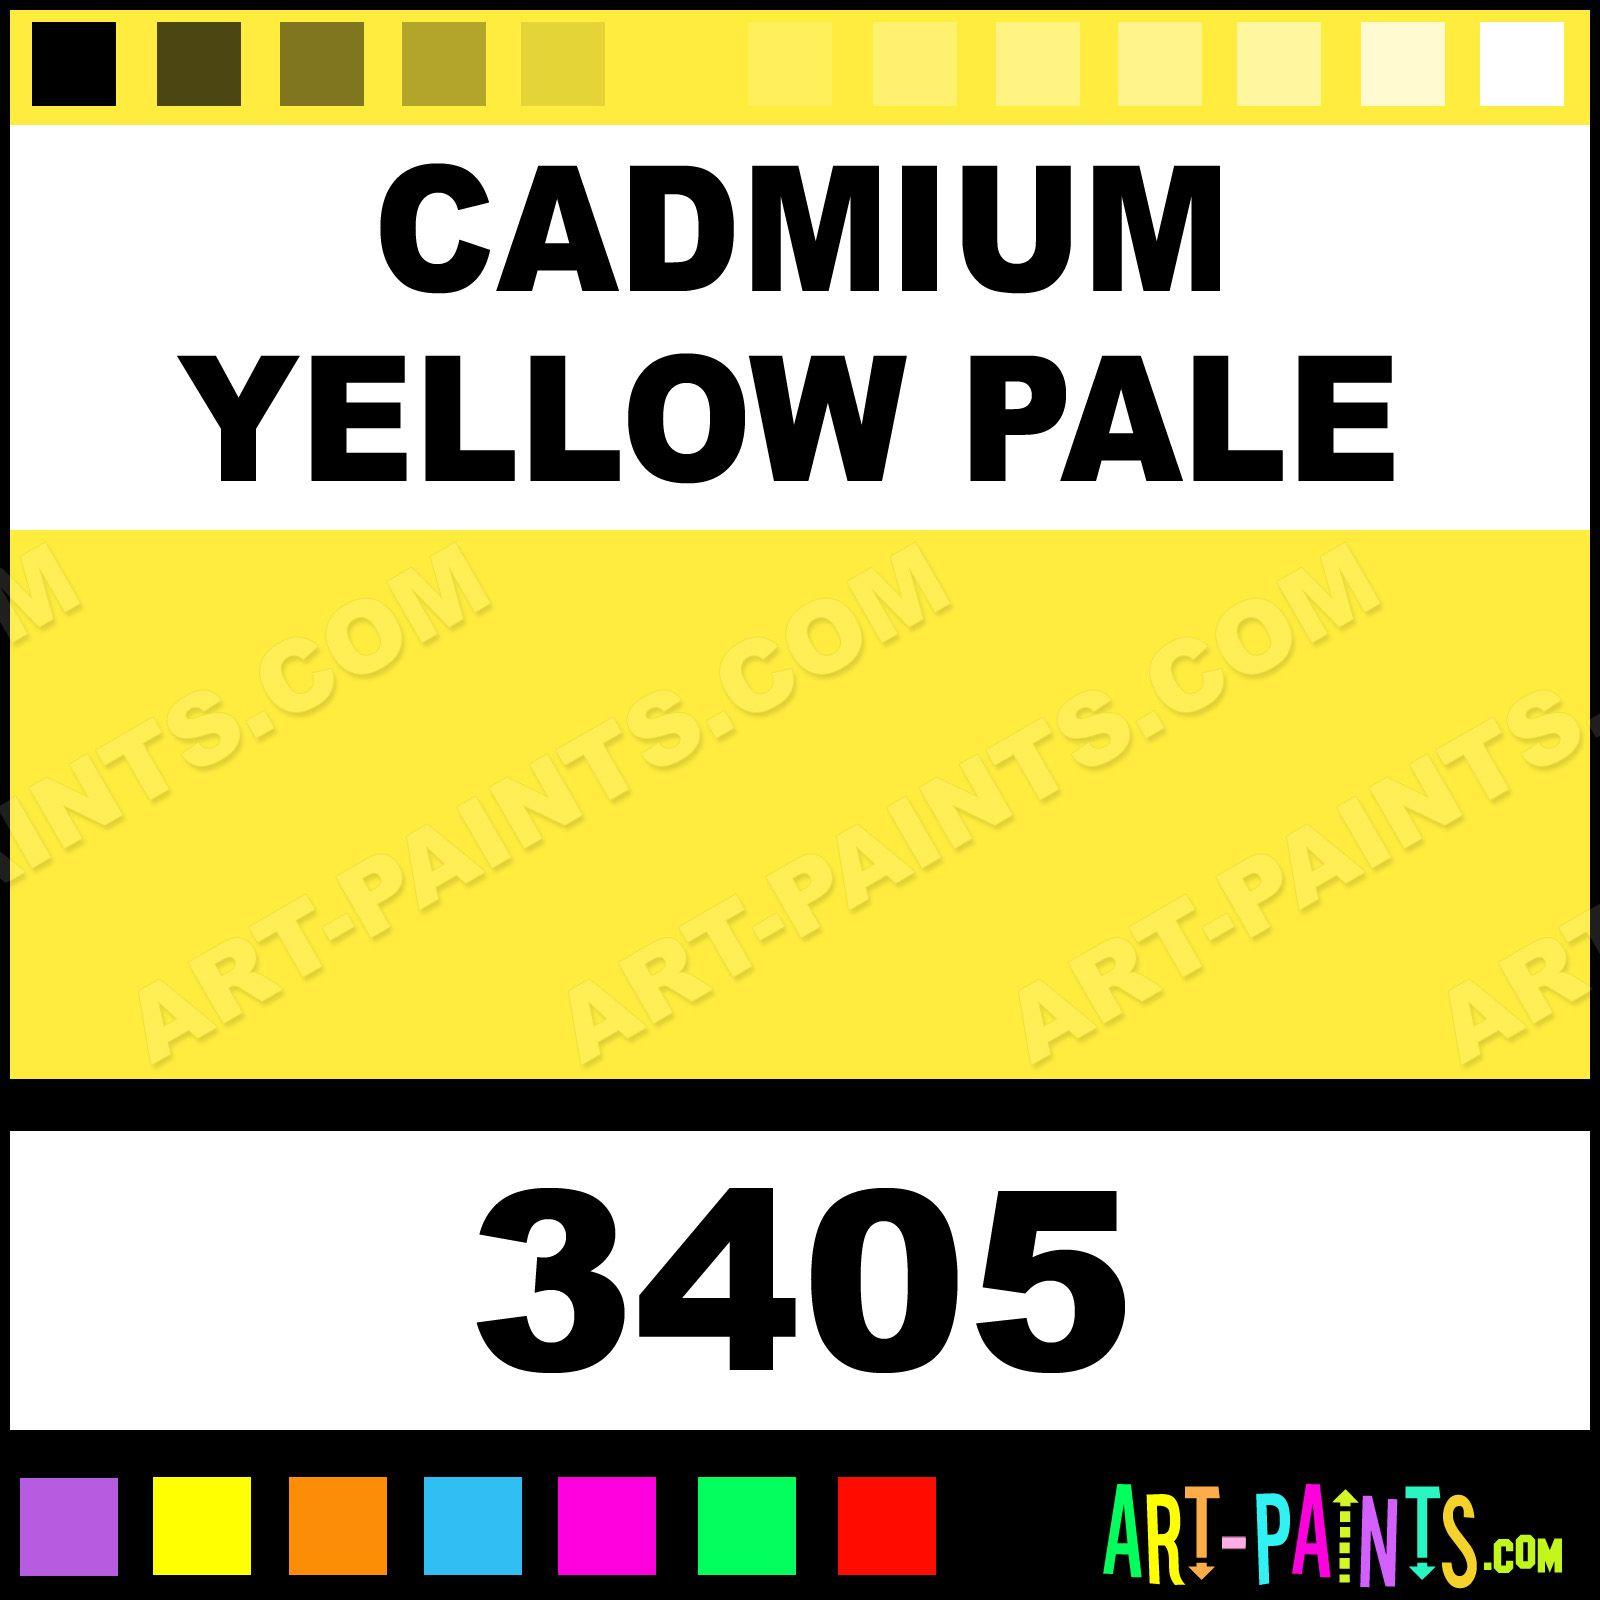 Cadmium Yellow Pale FfecD